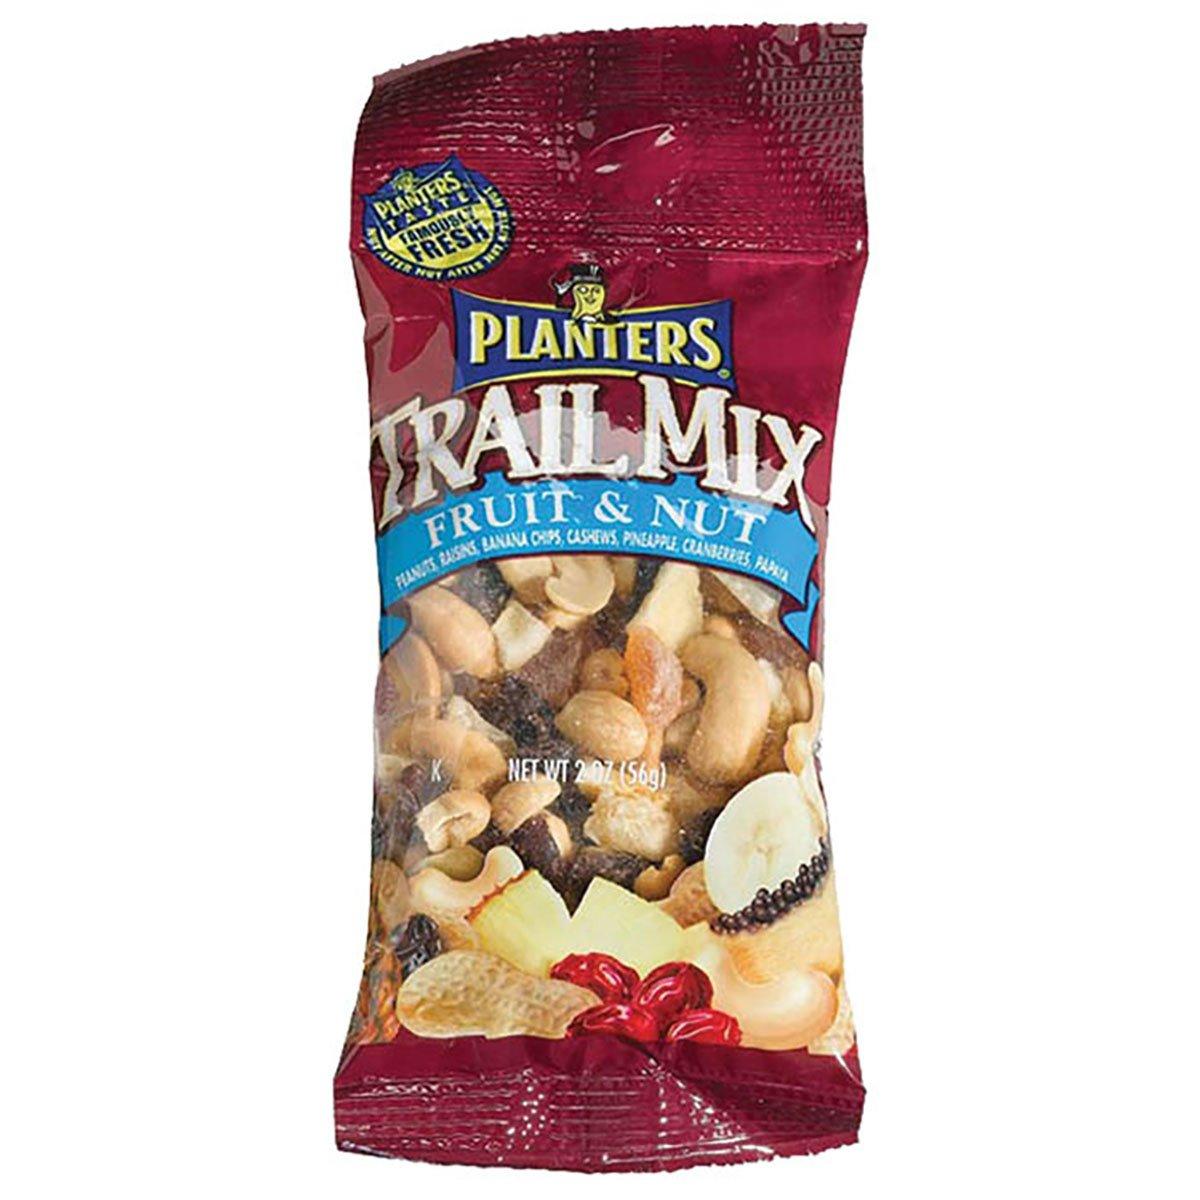 Planters Trail Mix - Fruit & Nut Fruit & Nut by Kraft (Image #1)